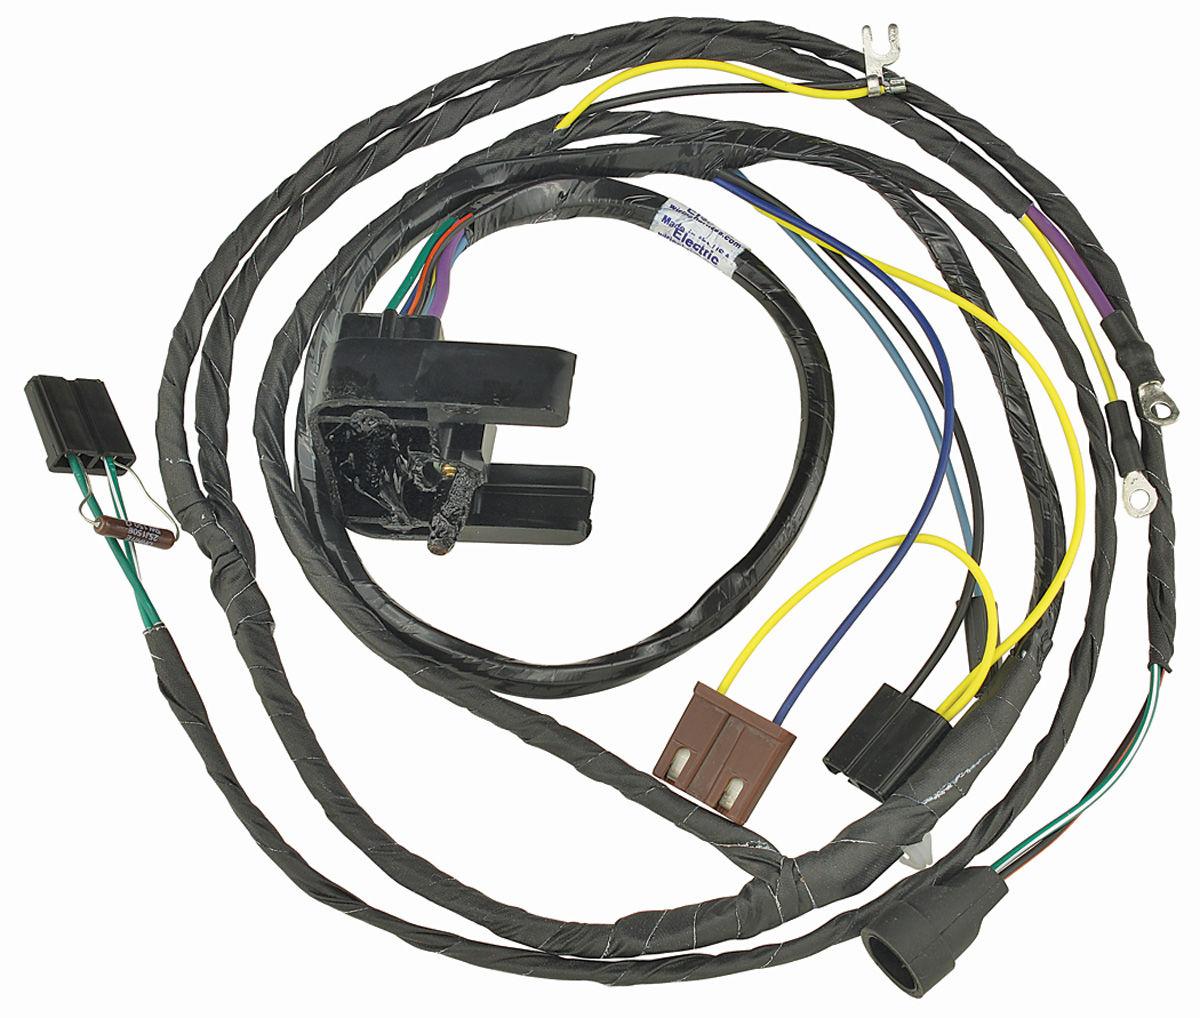 1986 oldsmobile 442 wiring diagram 1971 oldsmobile 442 wiring harness m&h engine harness v8 automatic transmission fits 1971 cutlass/442 @ opgi.com #7